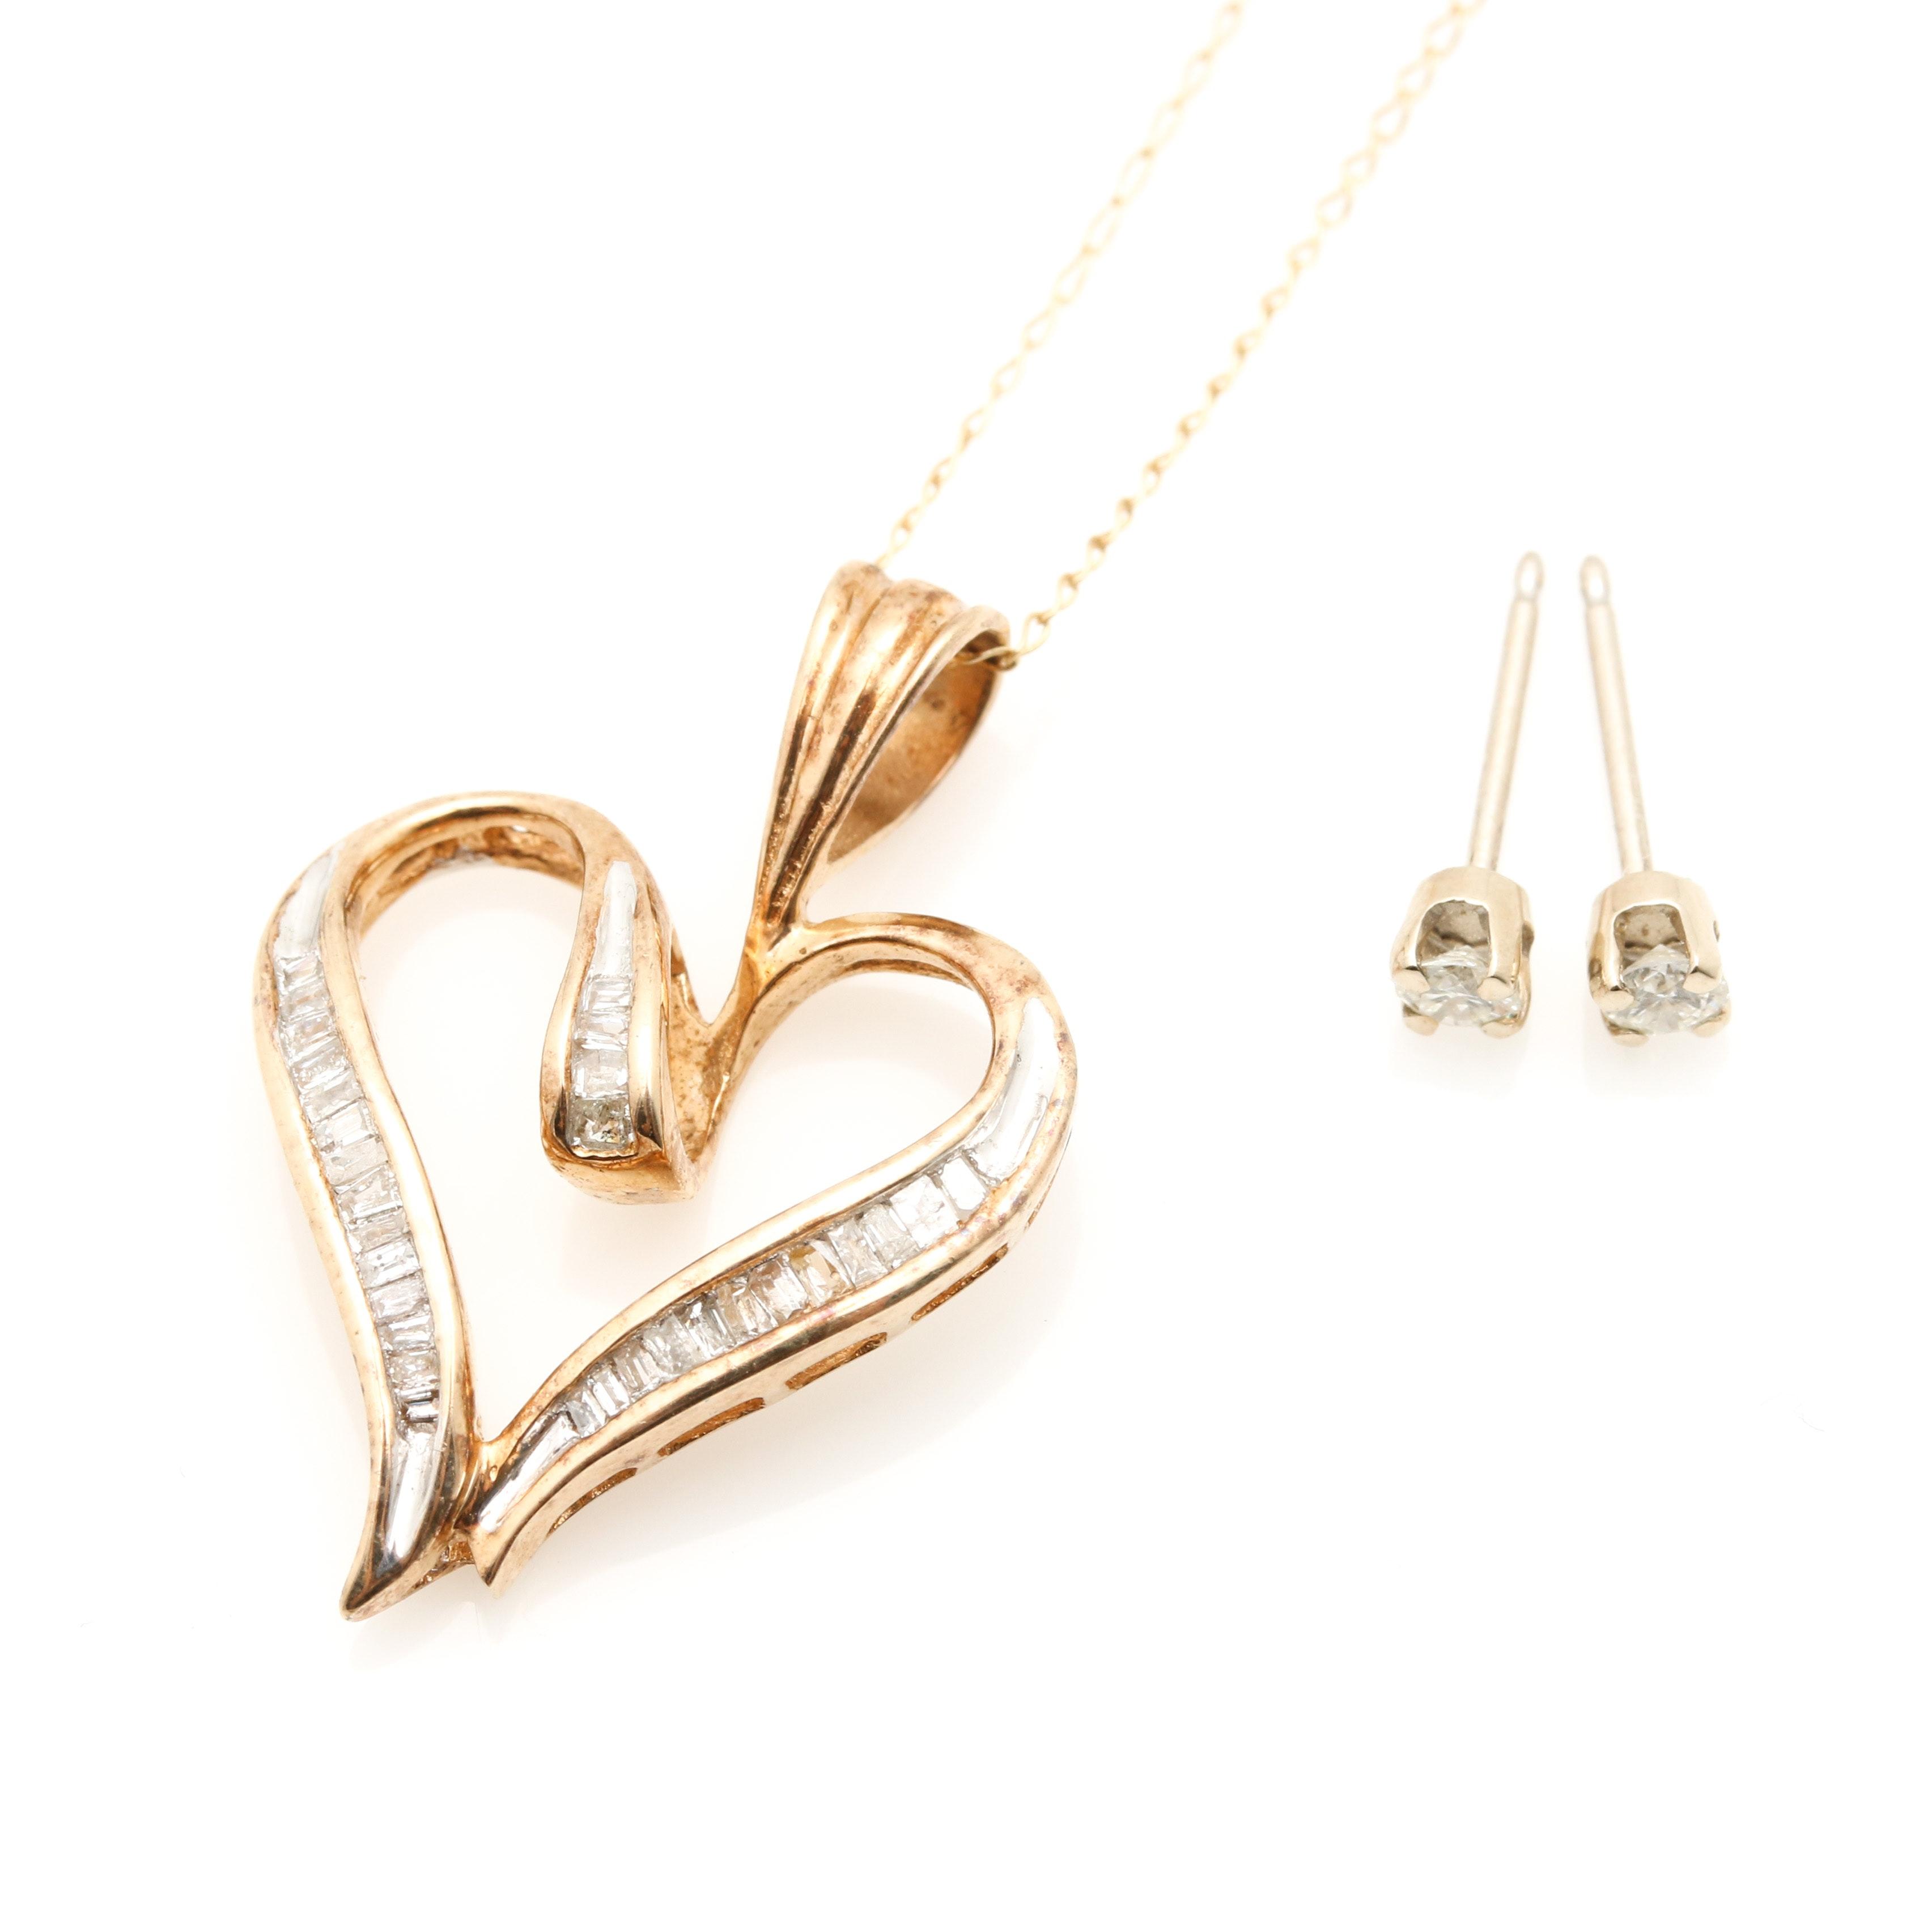 10K Yellow Gold and 14K White Gold Diamond Jewelry